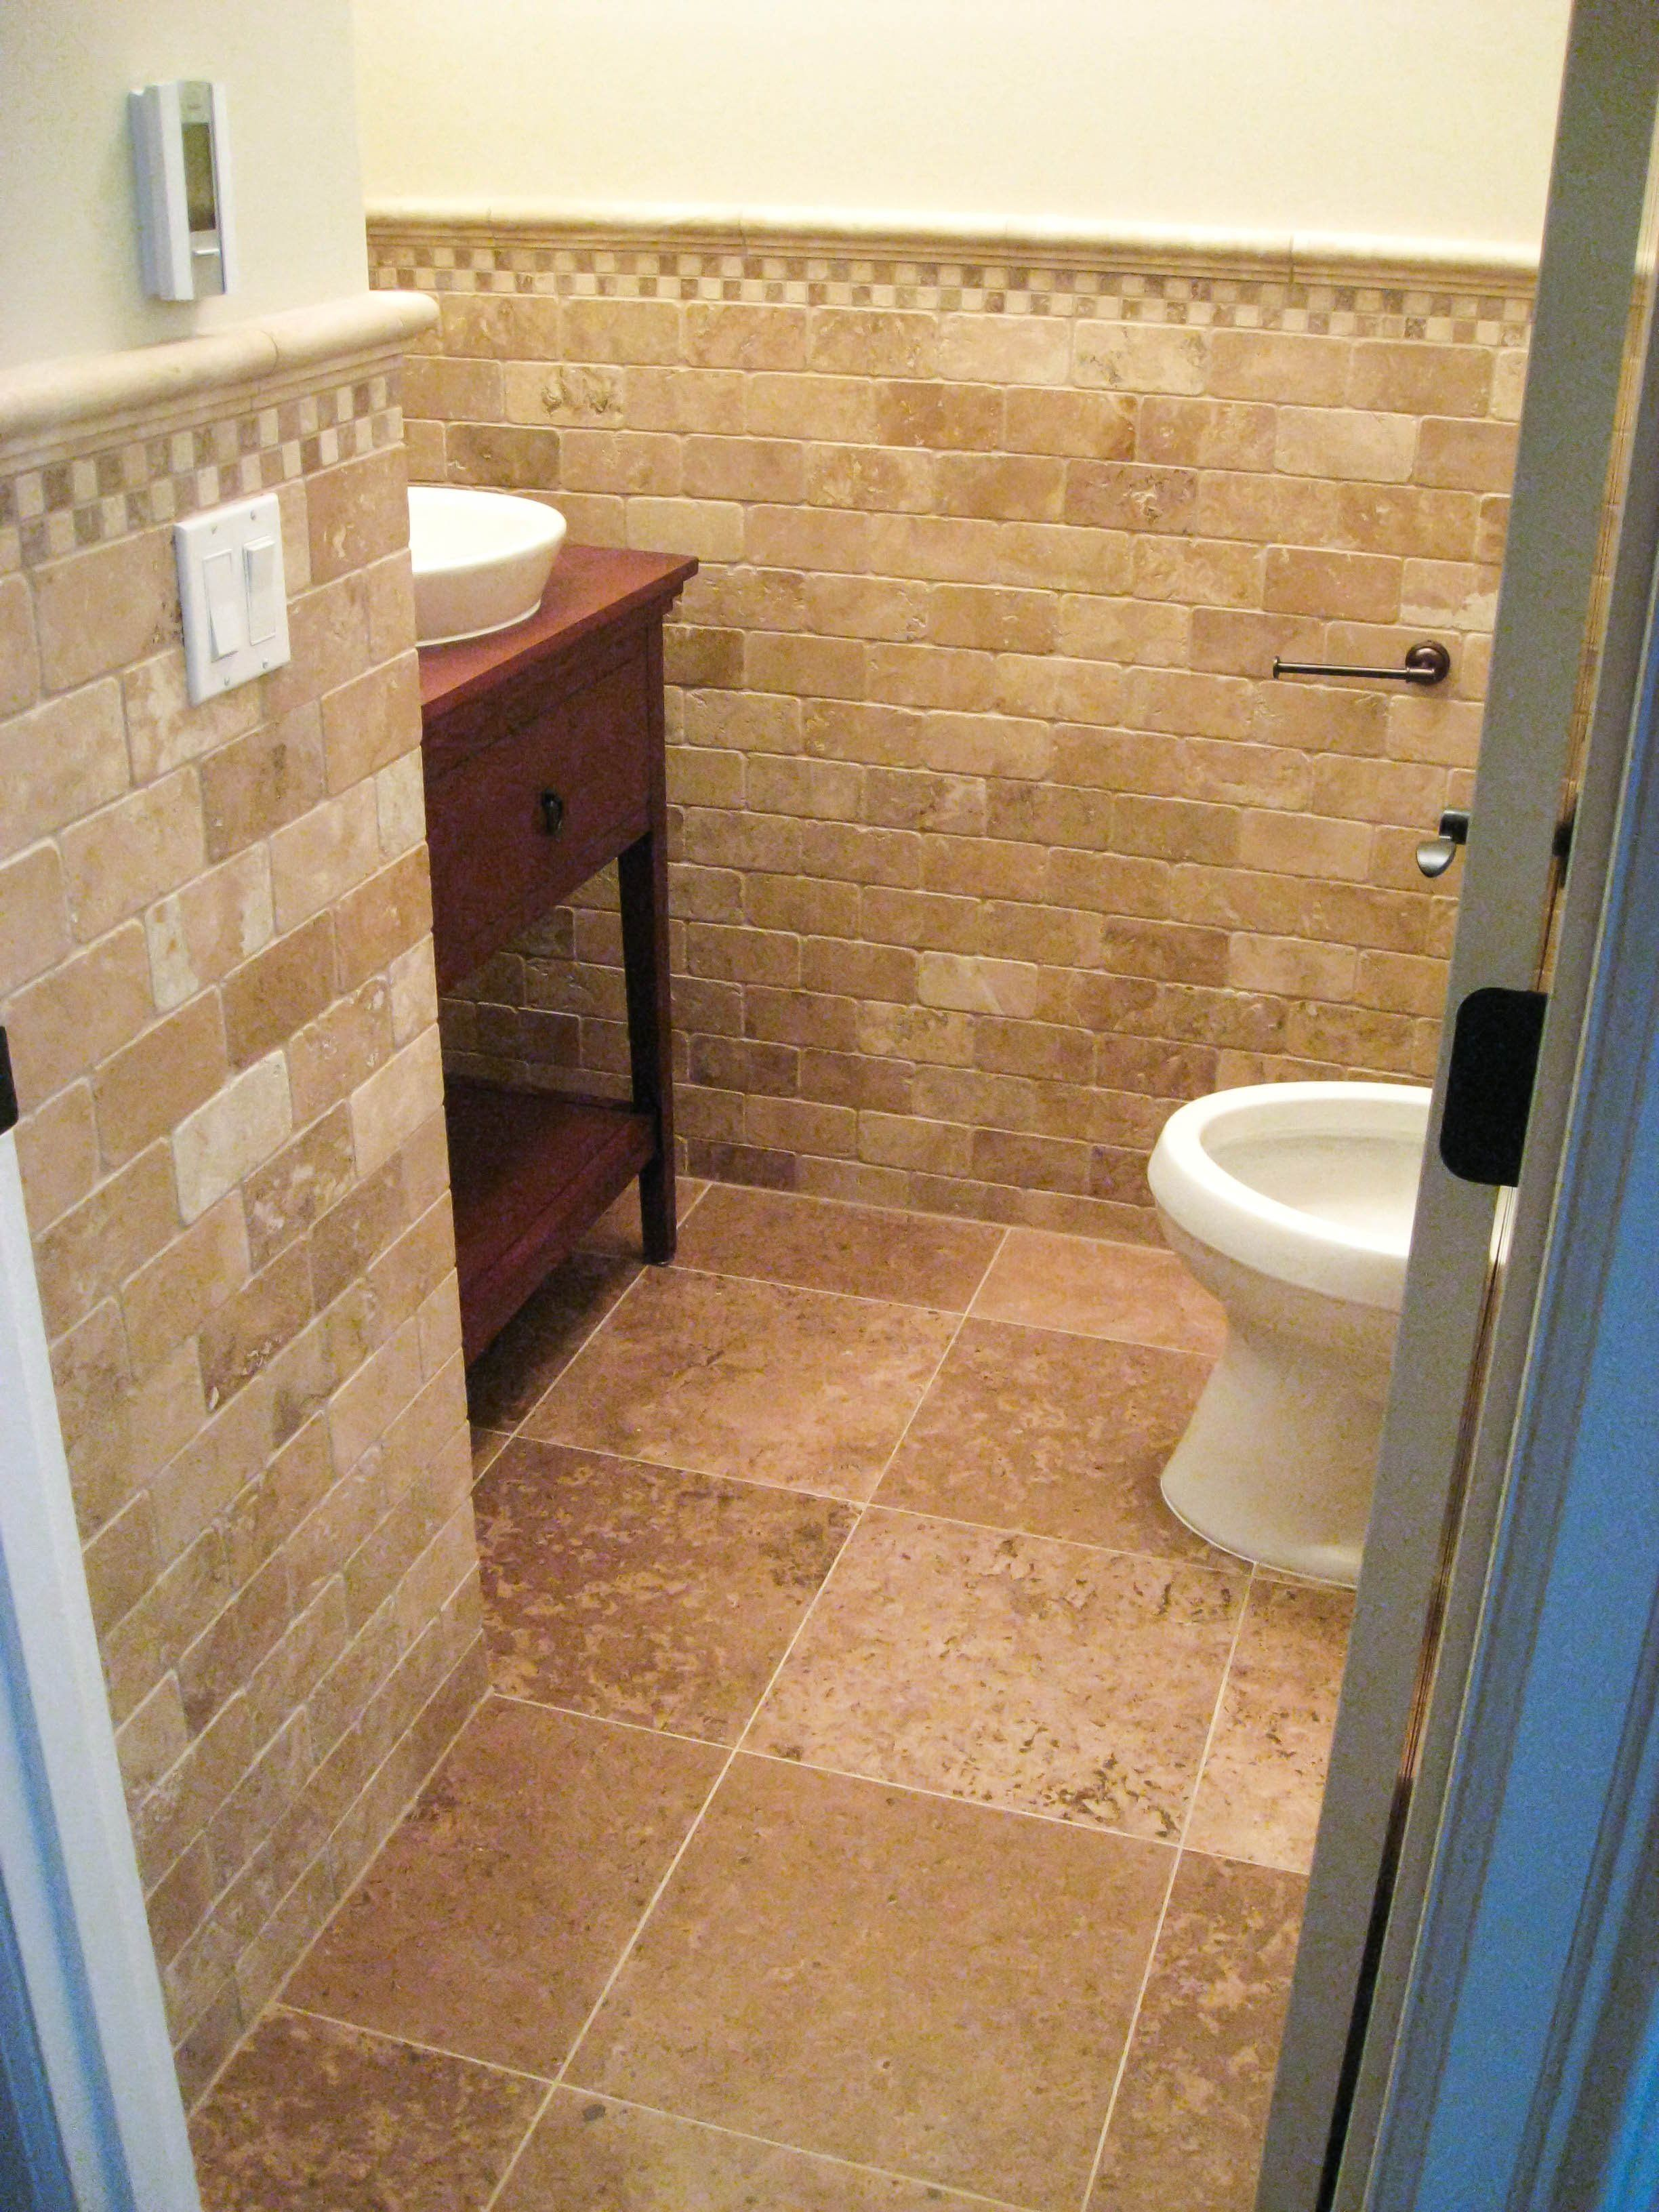 bathroom shower tile ideas traditional. bathroom trends shower tile ideas traditional :